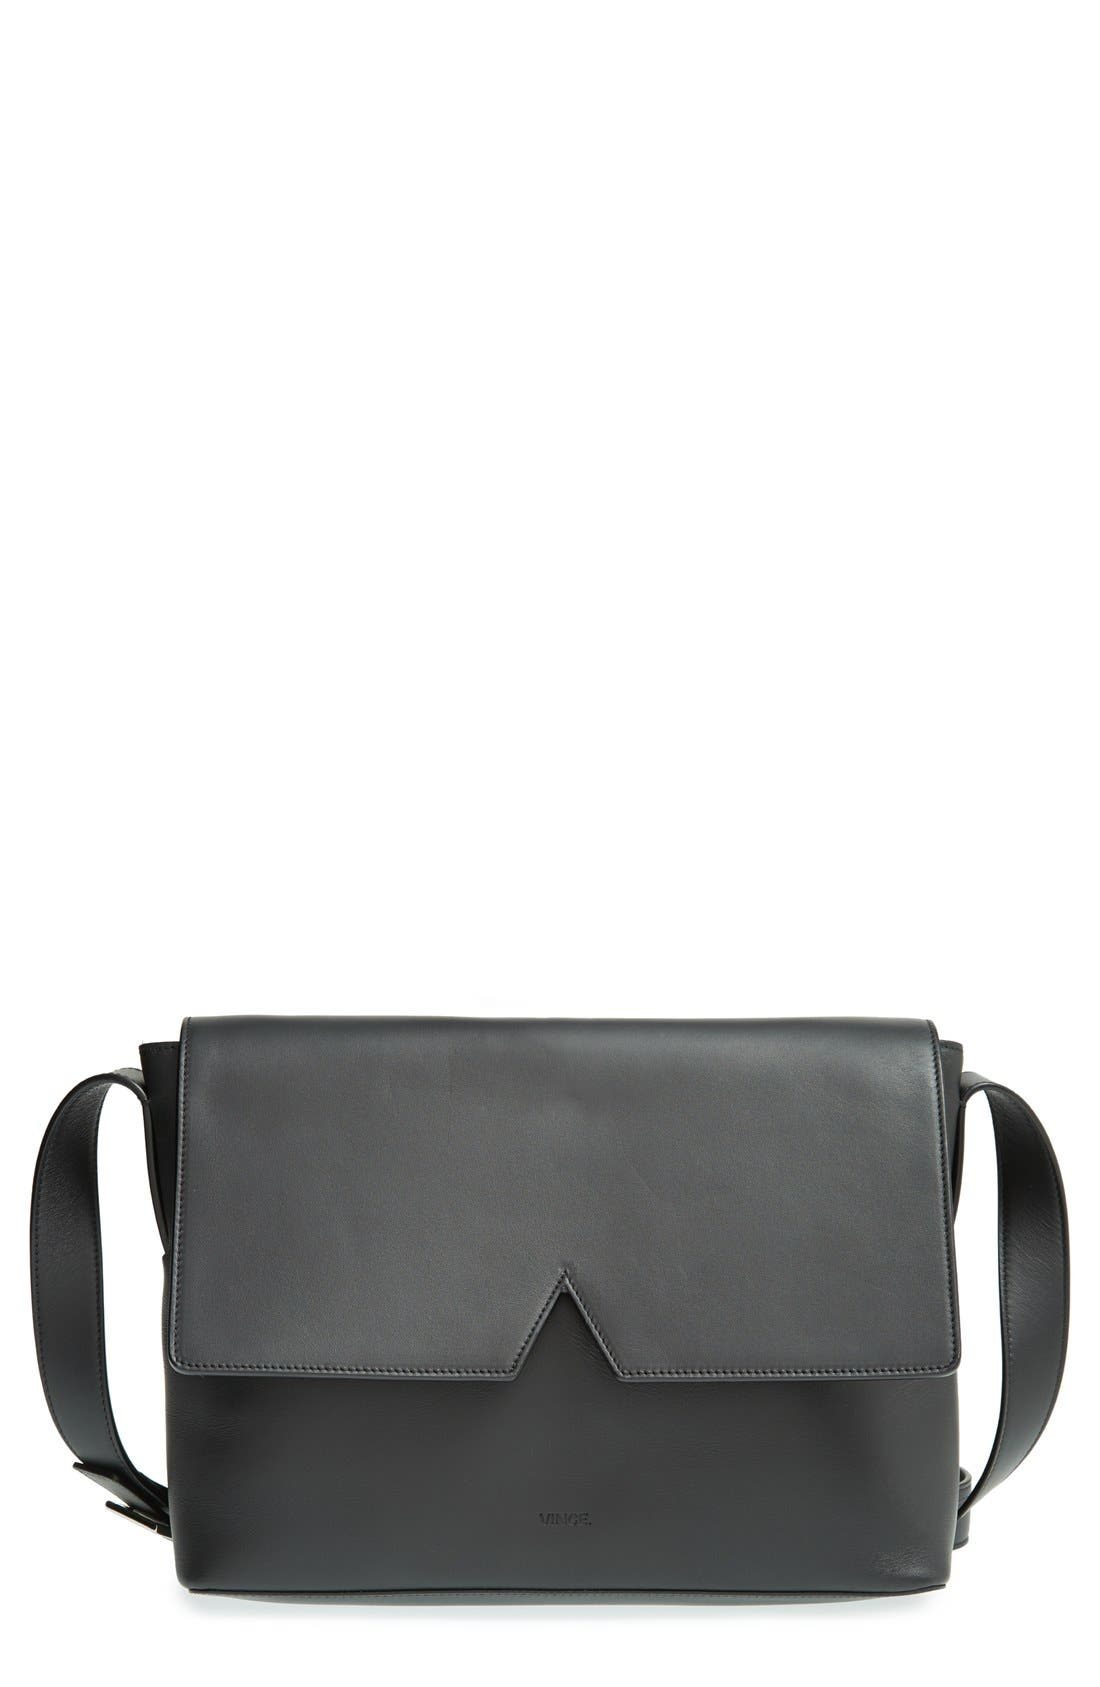 'Signature Collection - Medium' Leather Messenger Bag, Main, color, 001